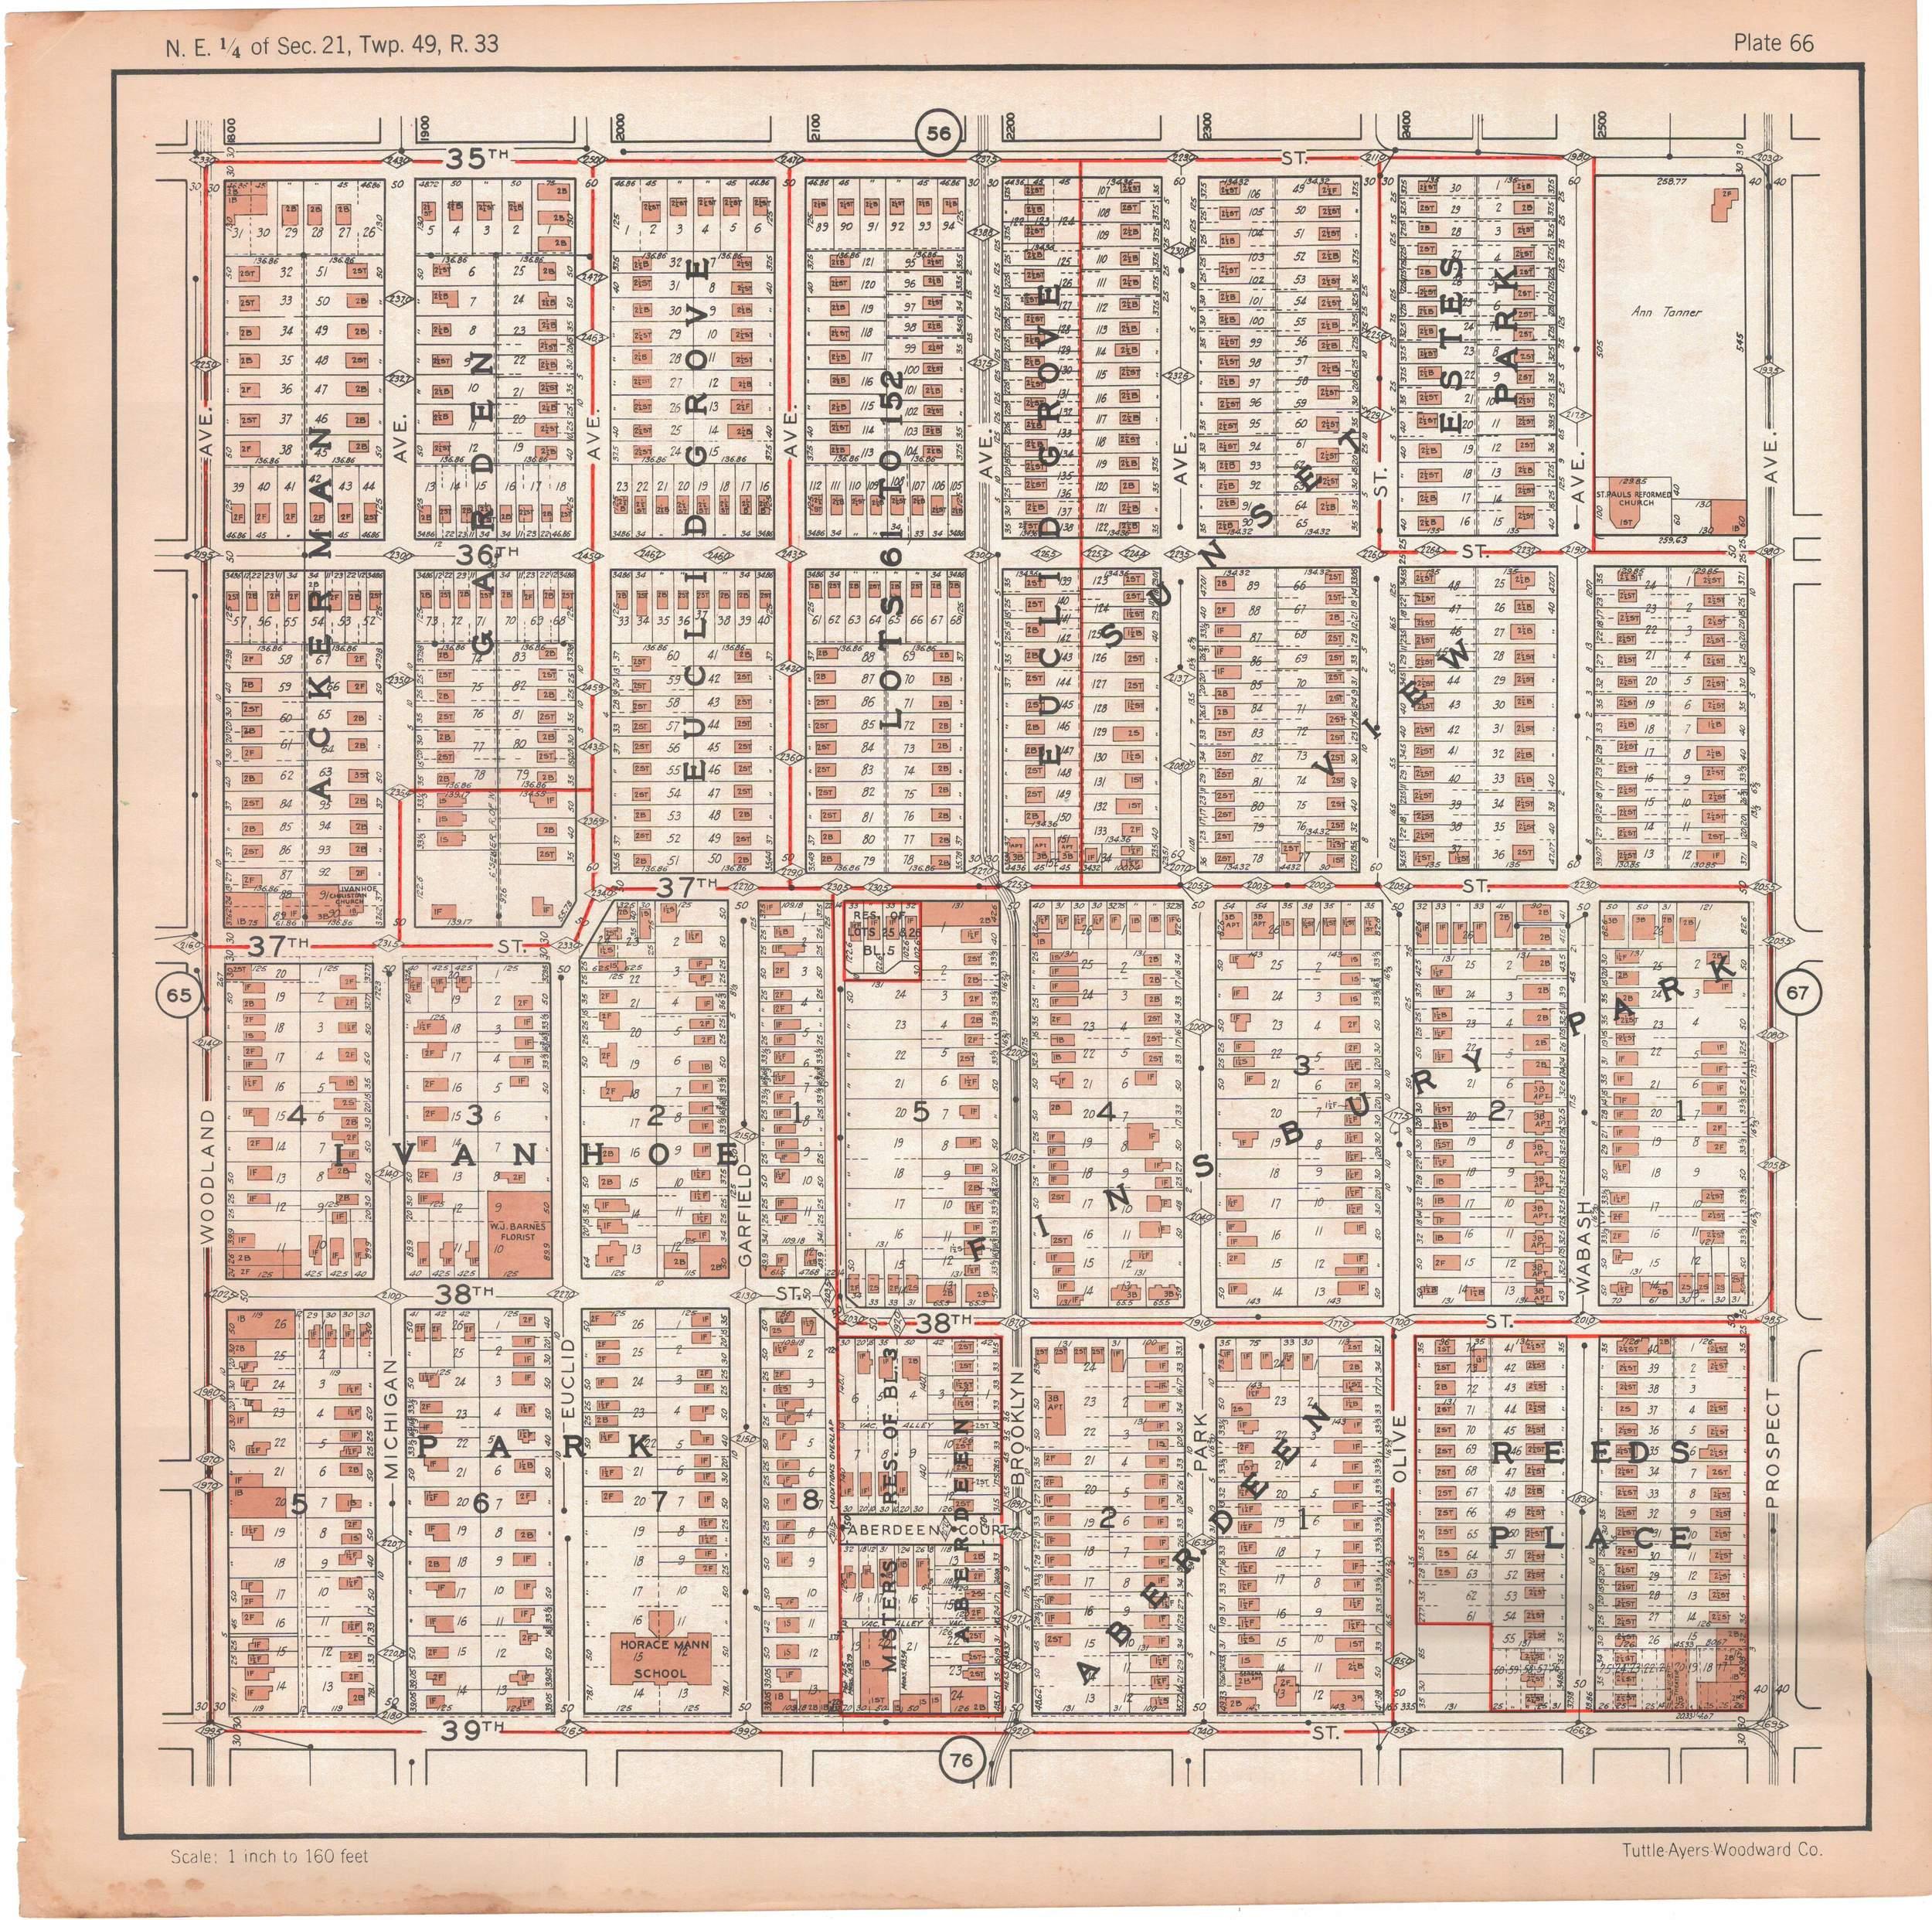 1925 TUTTLE_AYERS_Plate 66.JPG